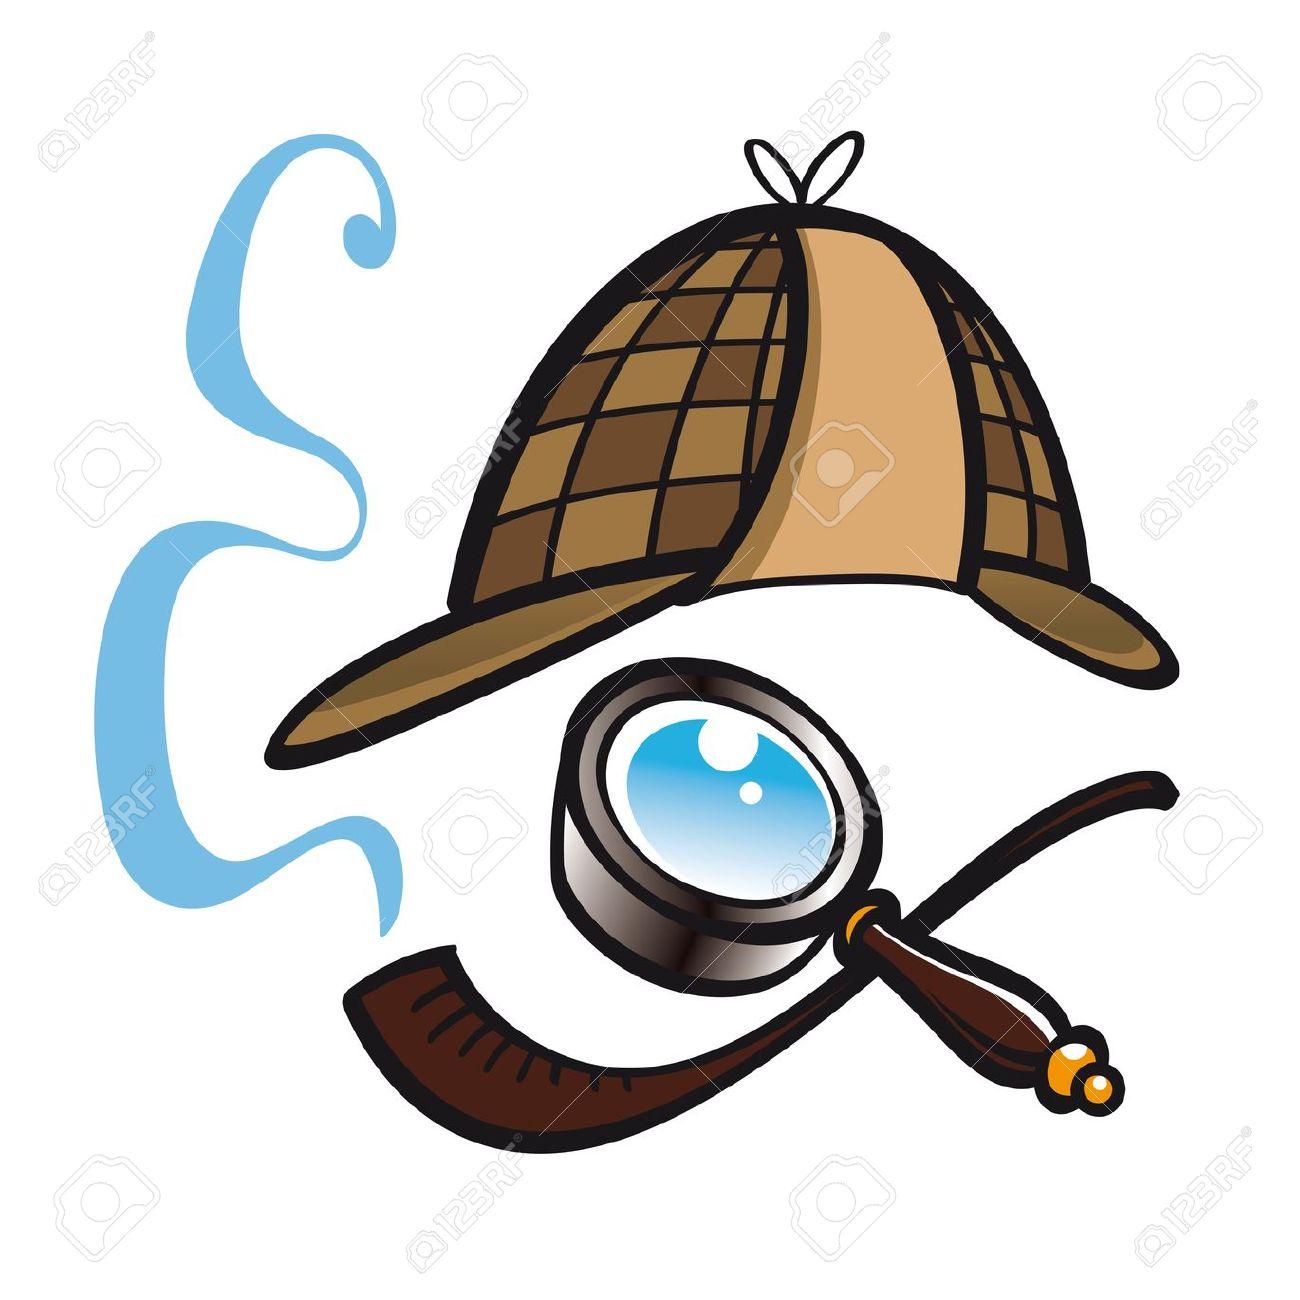 Clipart Of Sherlock Holmes-Clipart Of Sherlock Holmes-2